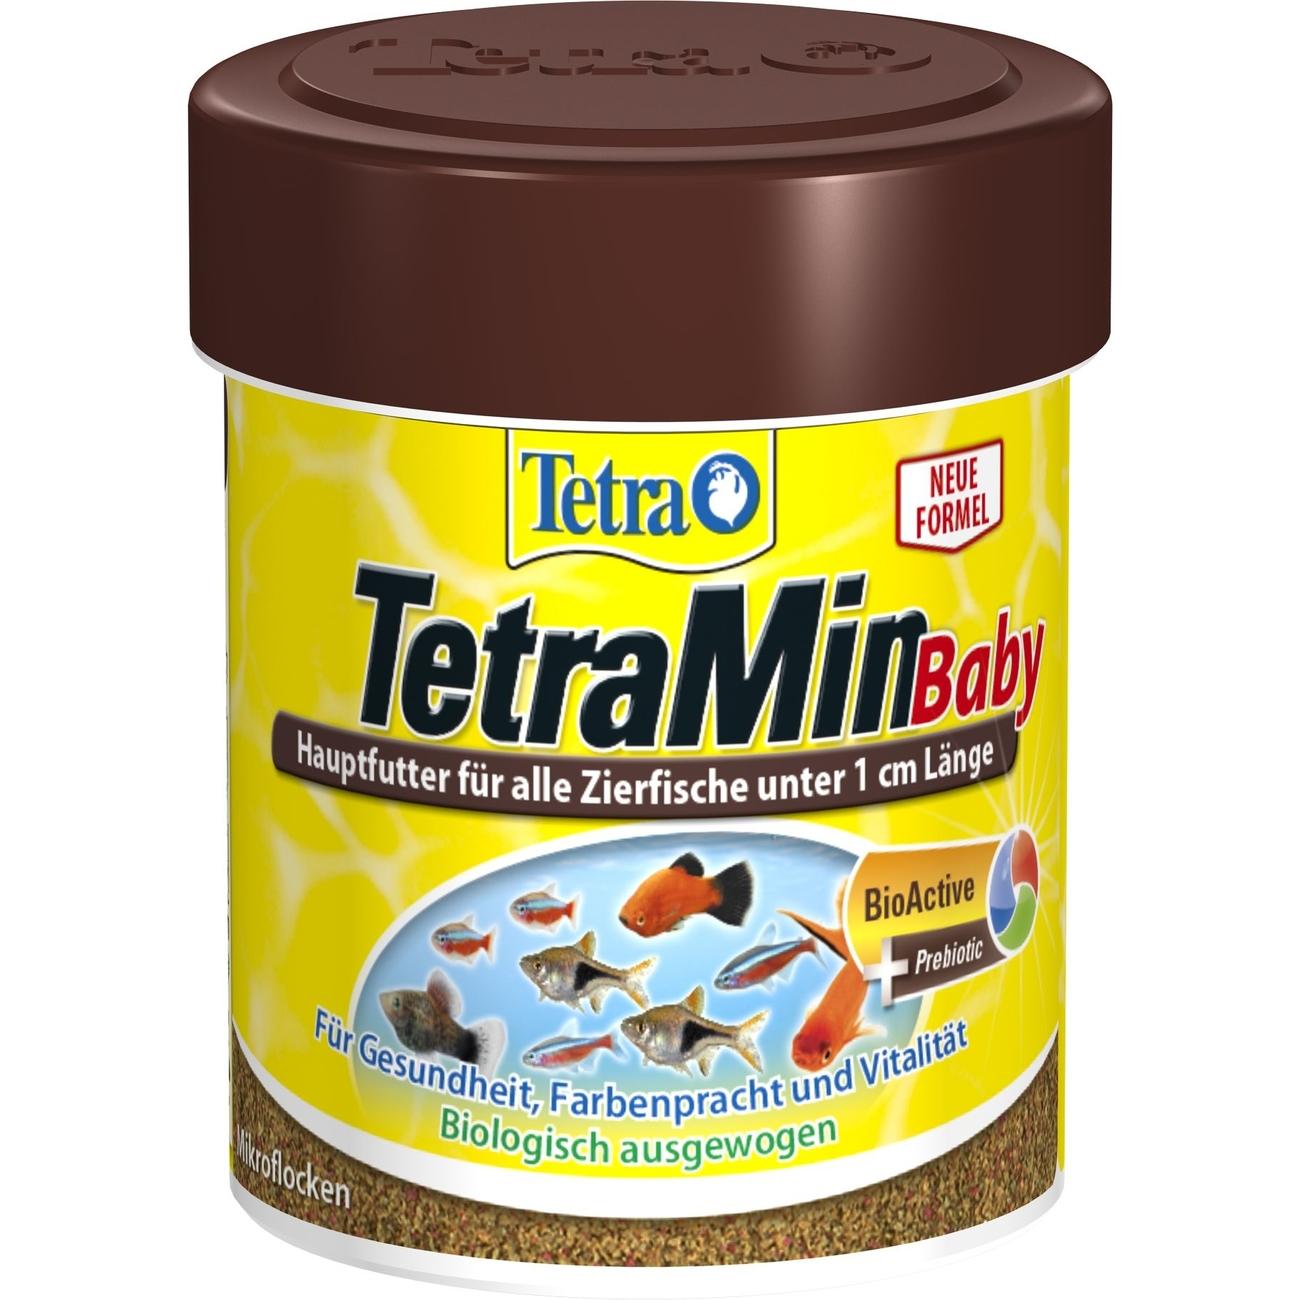 TetraMin Baby Preview Image